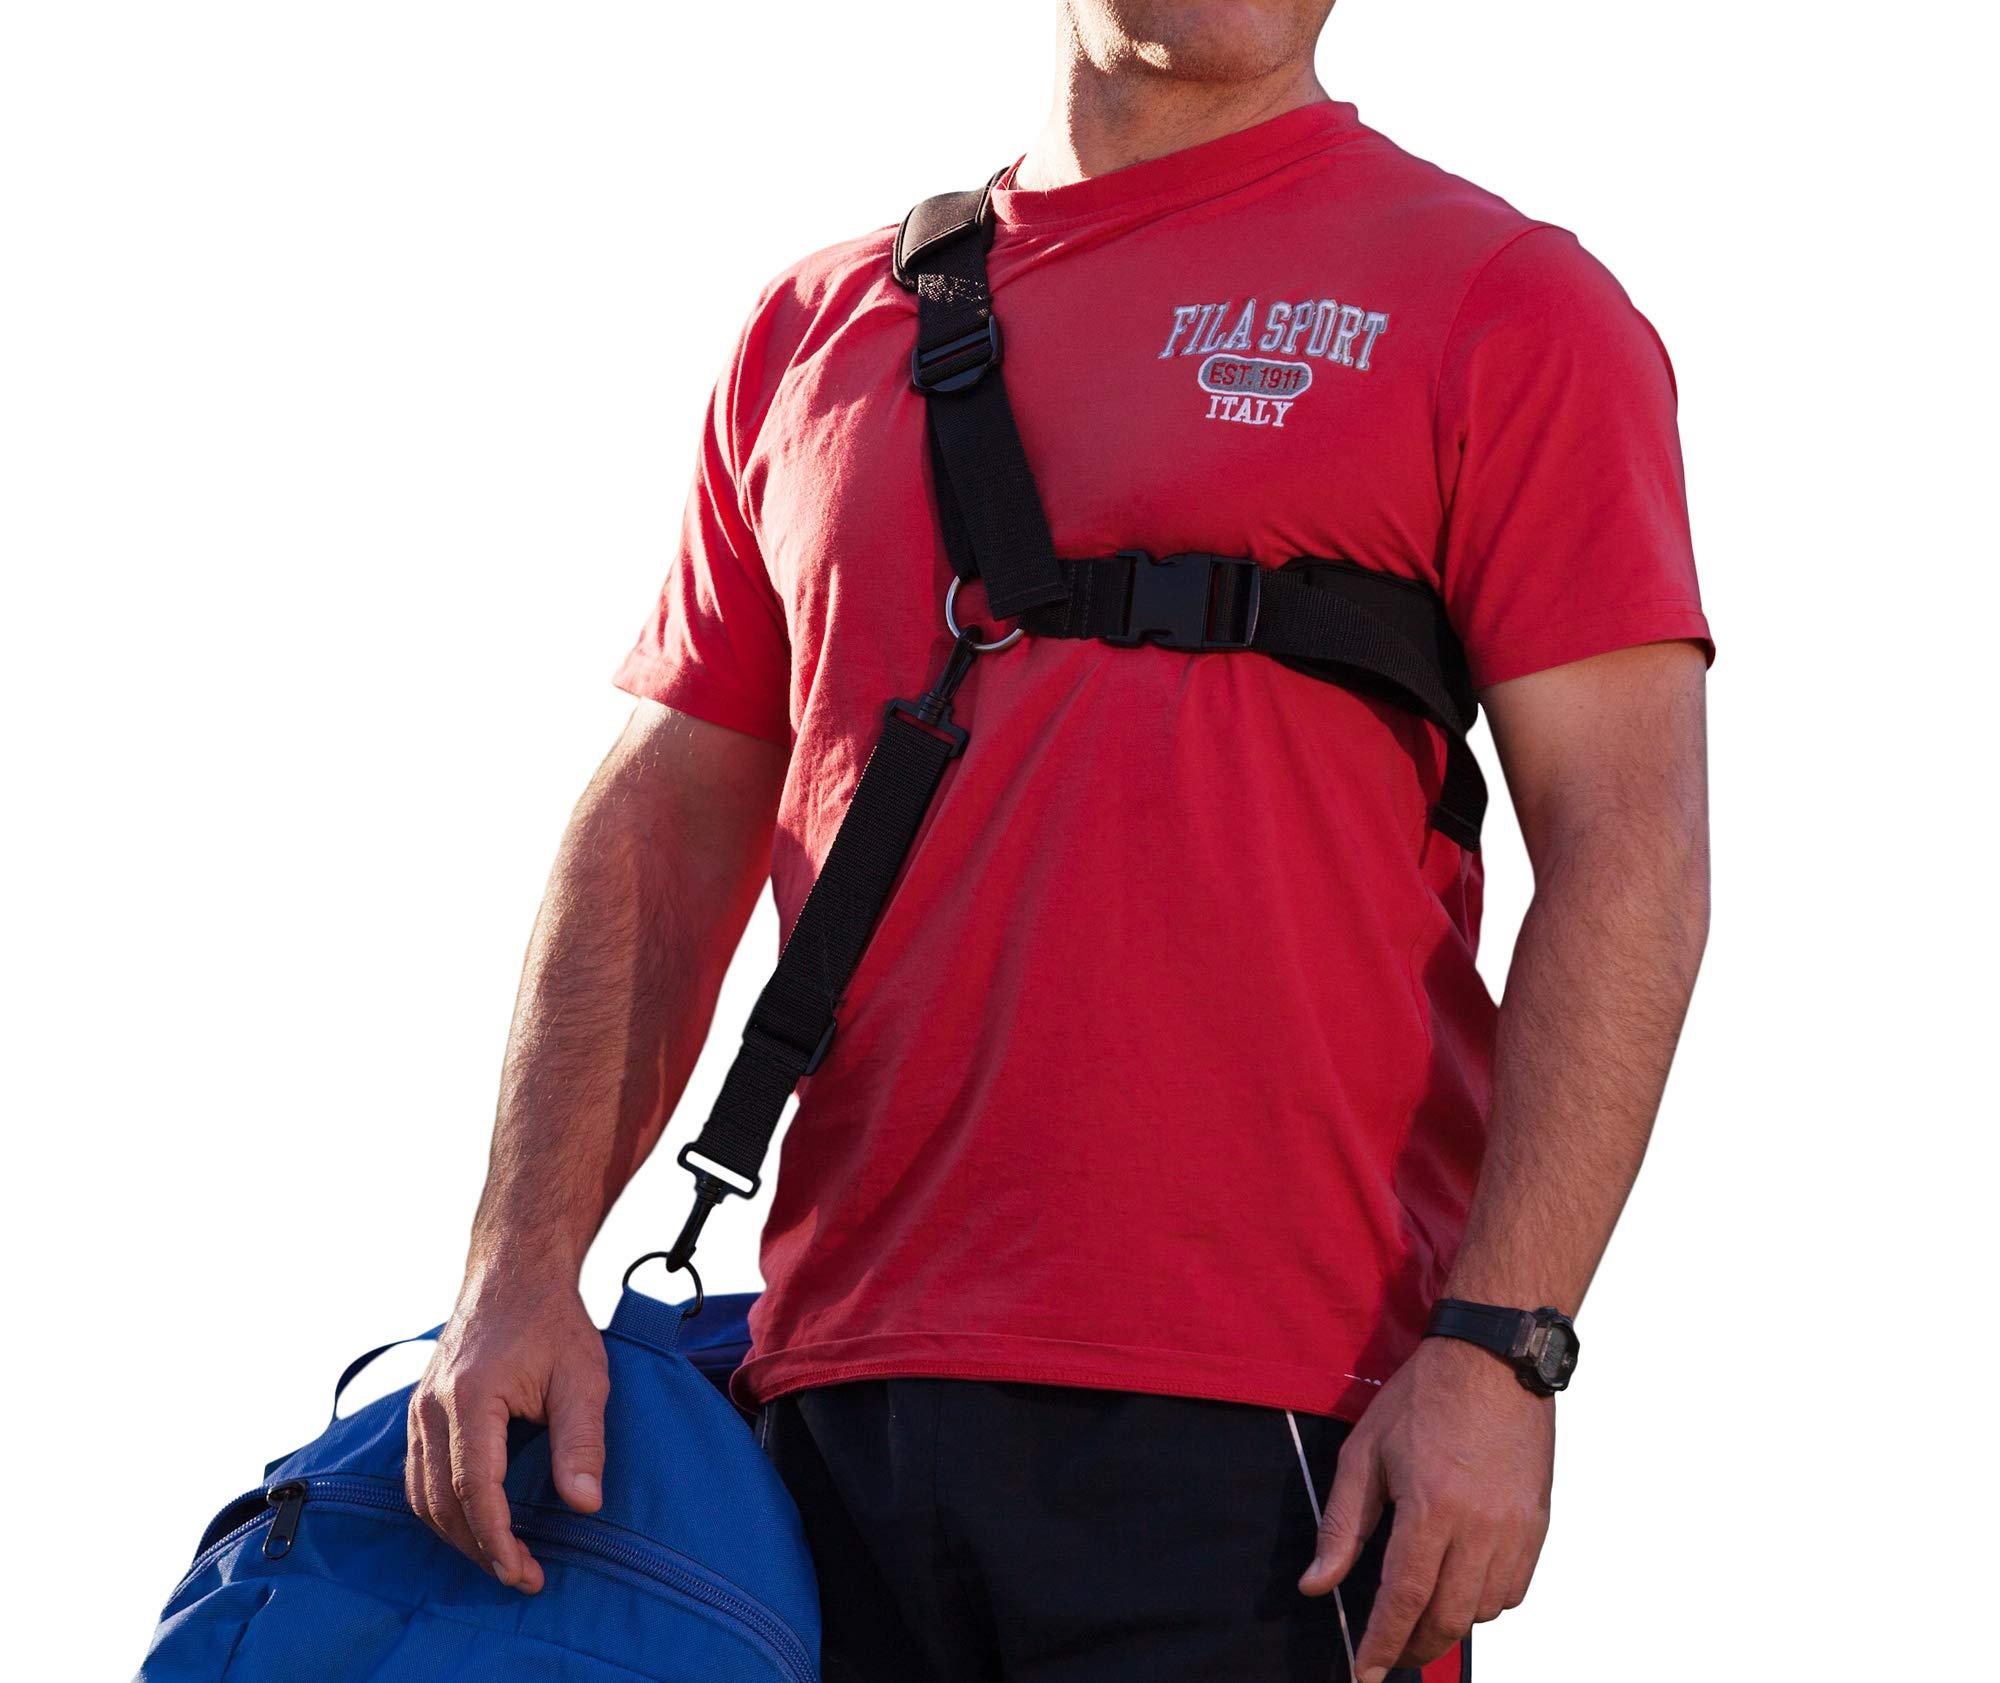 Ergonomic Shoulder Bag Carry Strap for Travel Luggage & Sports Equipment